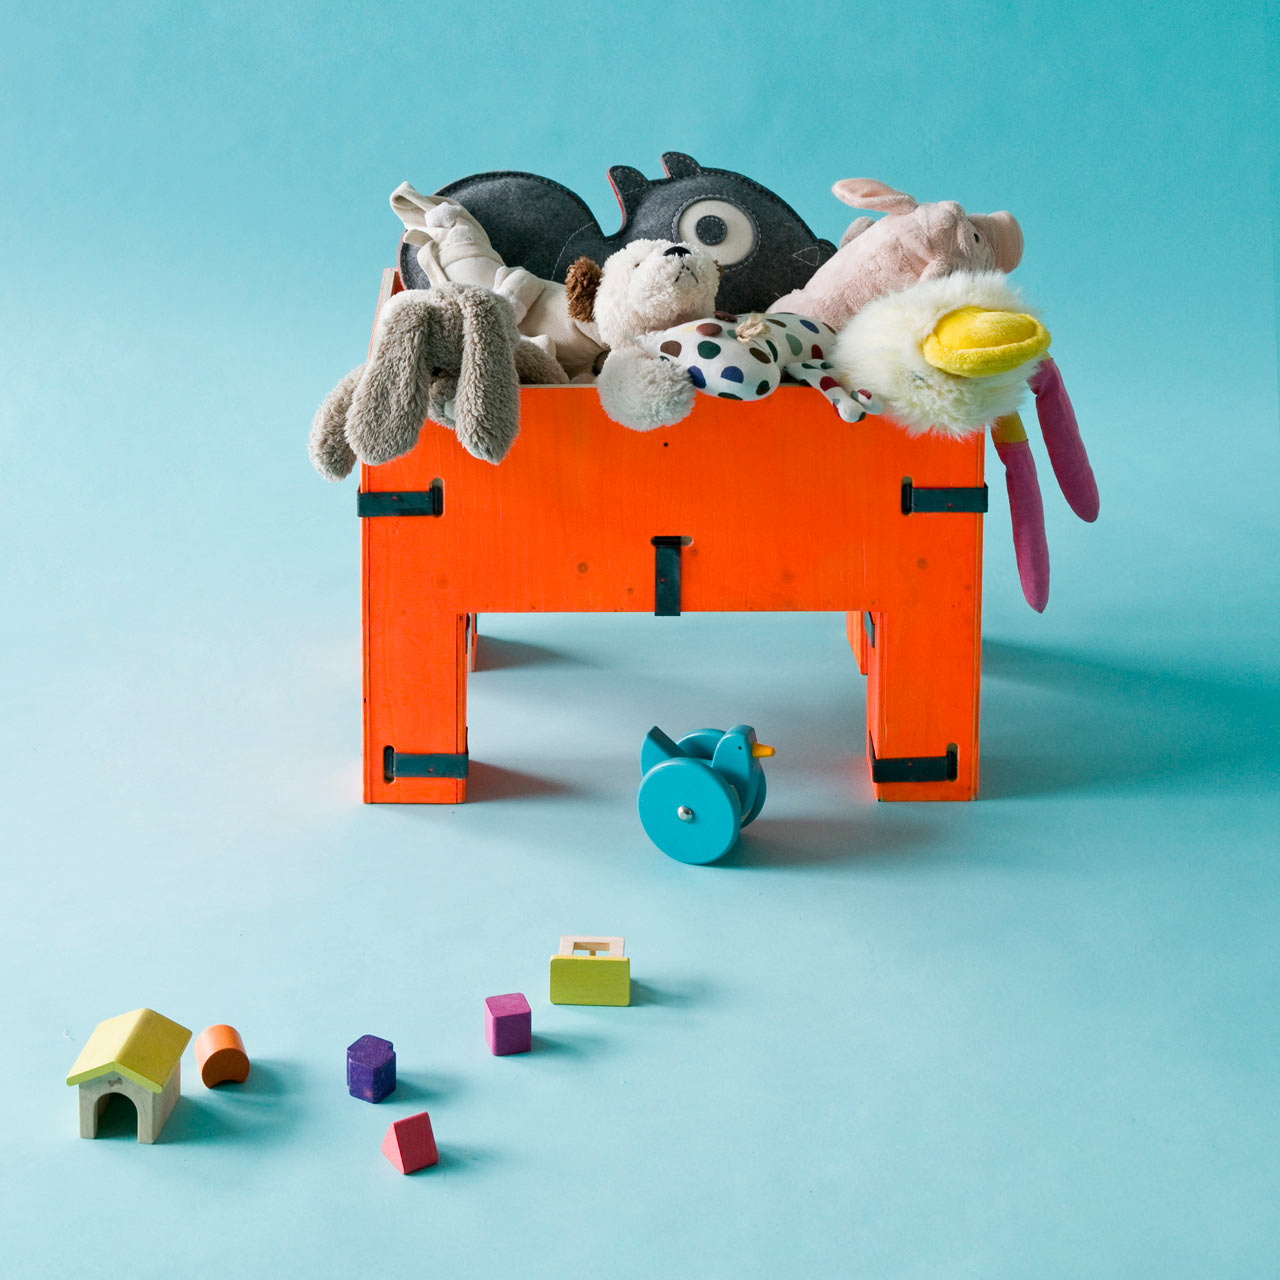 Pakiet-Modular-Furniture-hisheji (3)